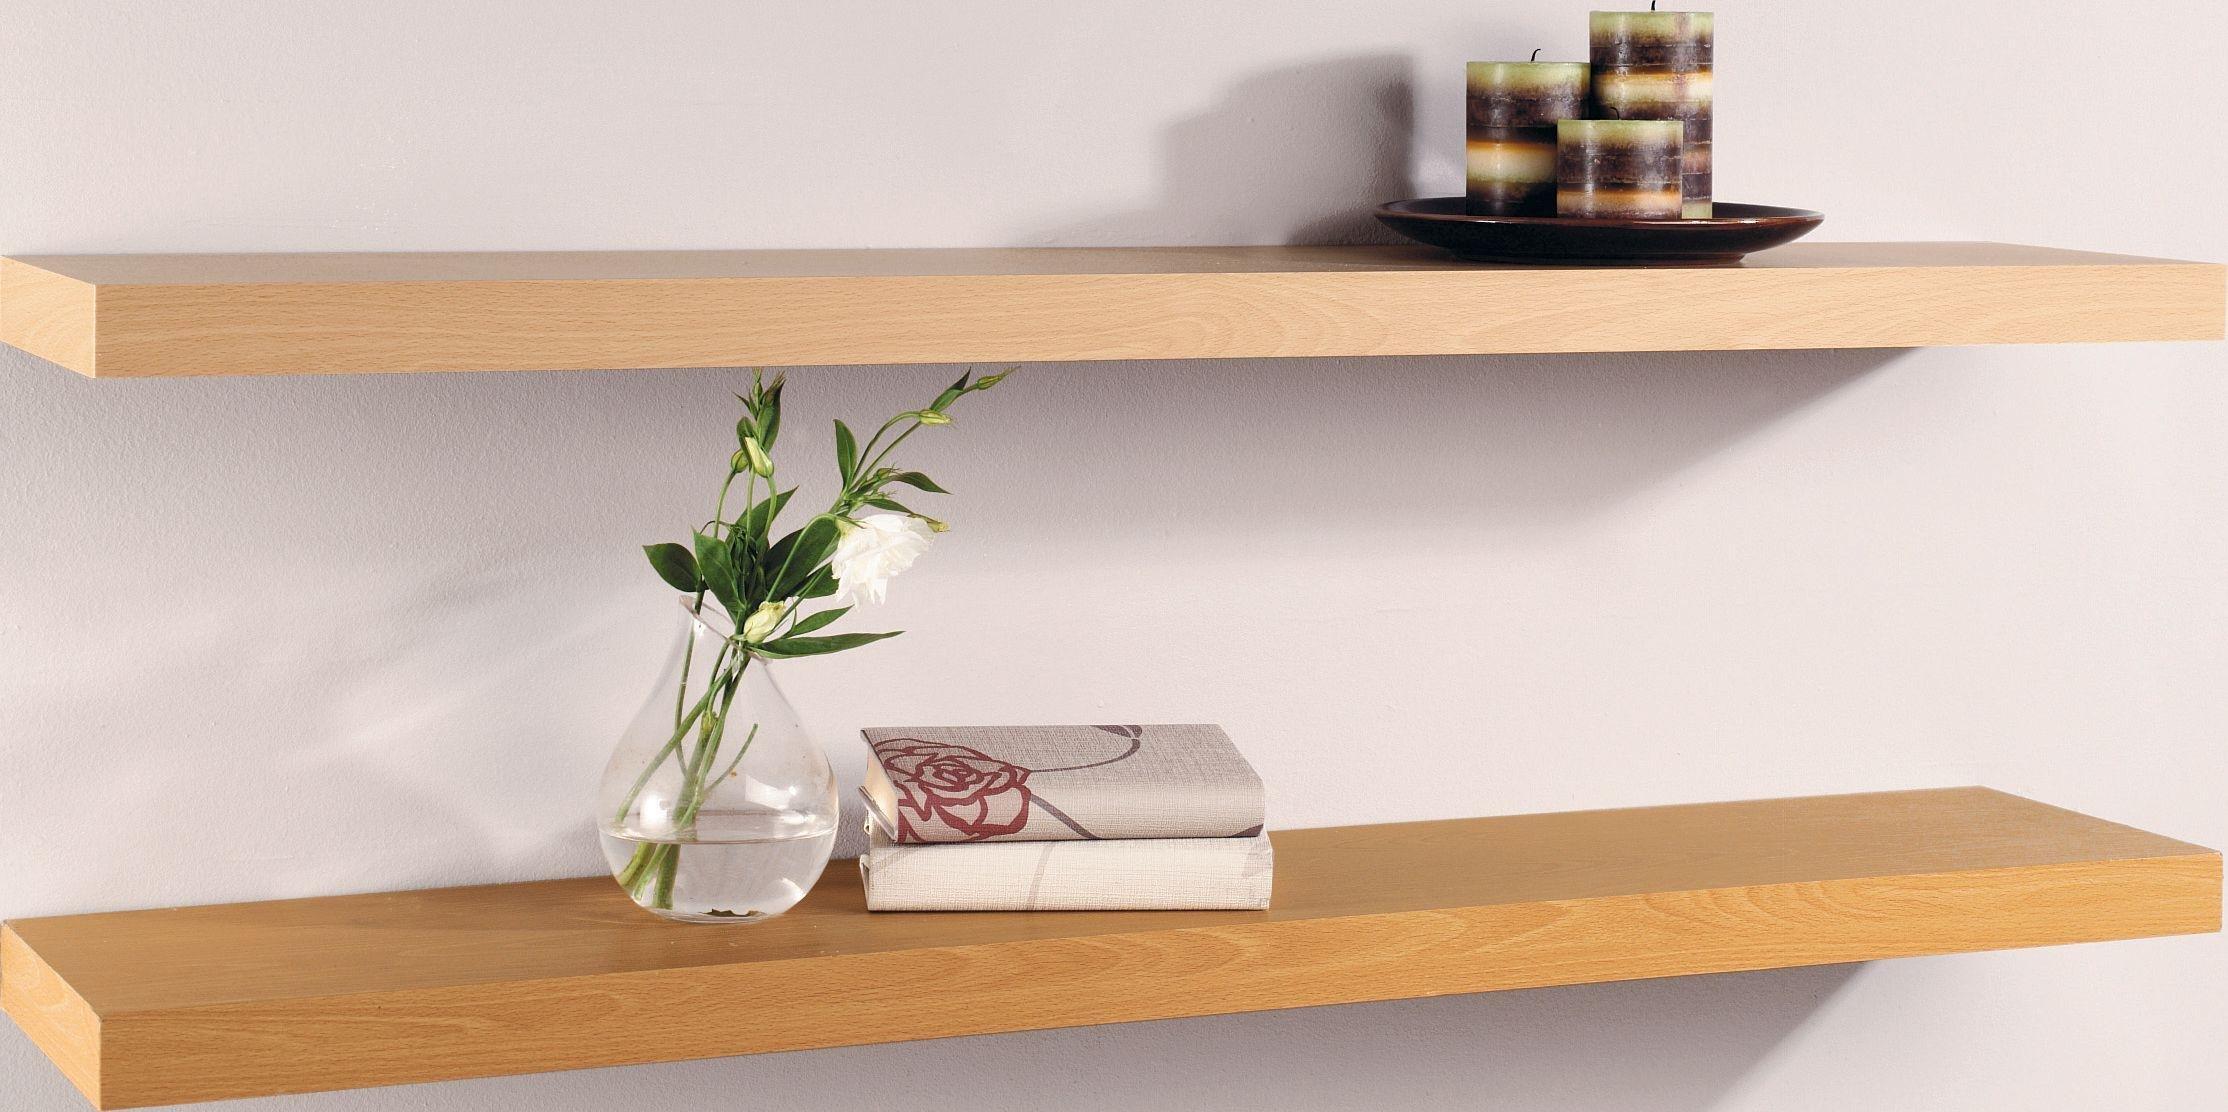 Floating Shelf buy home 120cm floating shelf - oak effect at argos.co.uk - your